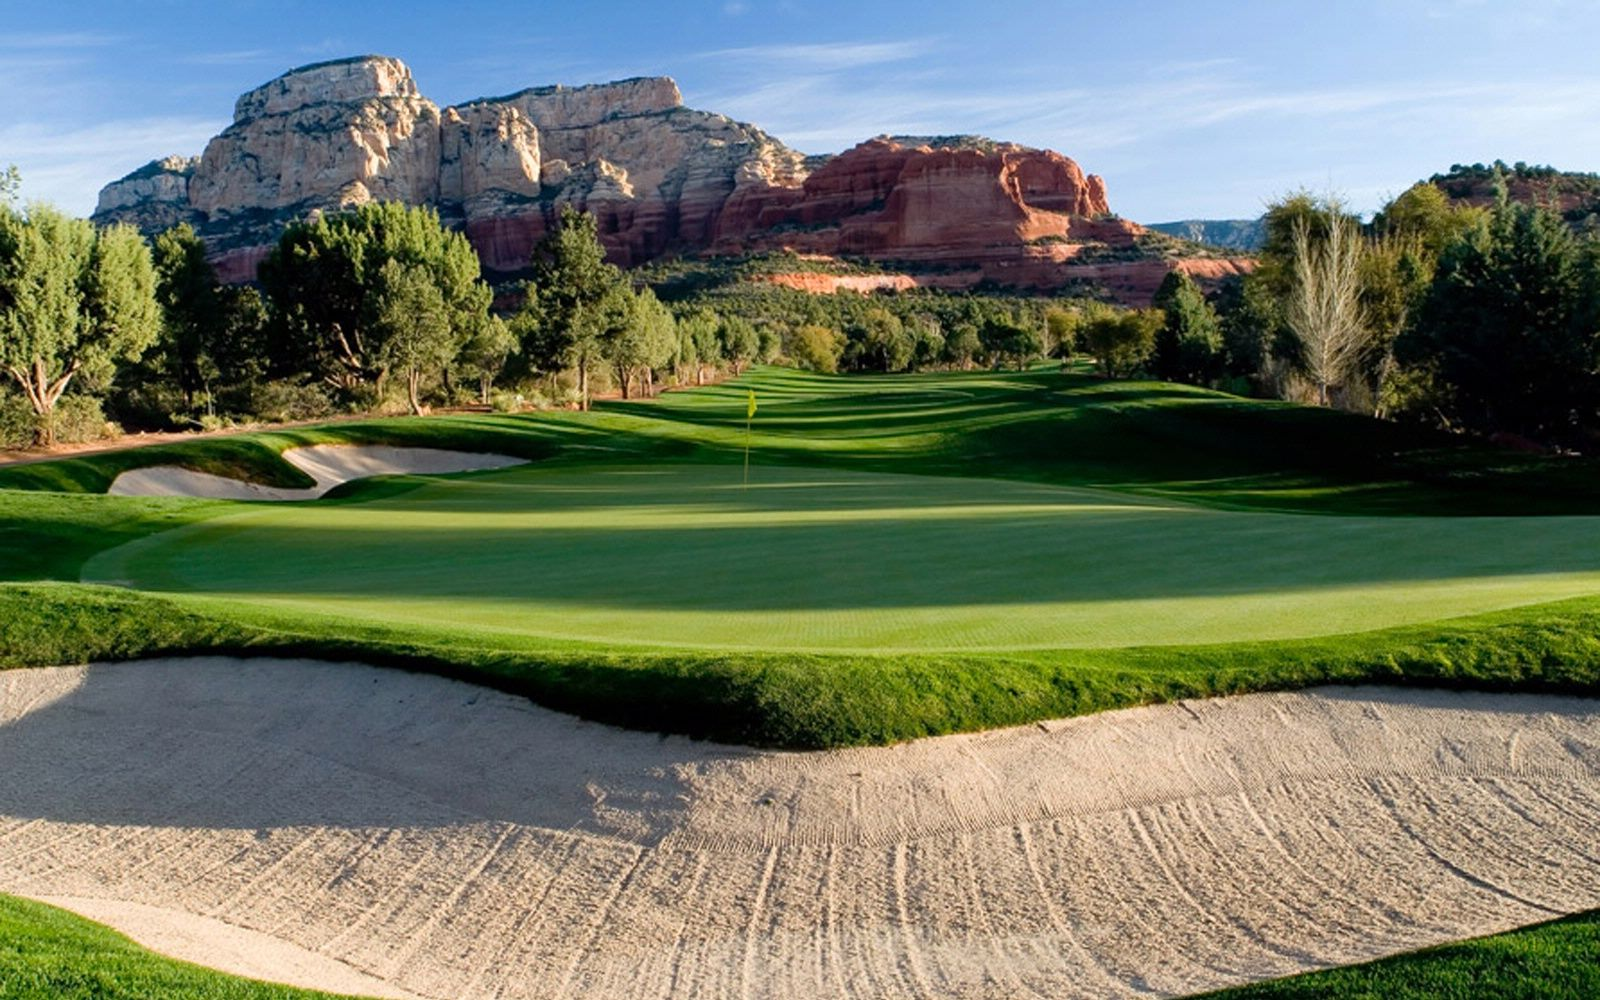 Seven Canyons Golf in Sedona, AZ | Golf courses, Best golf ...